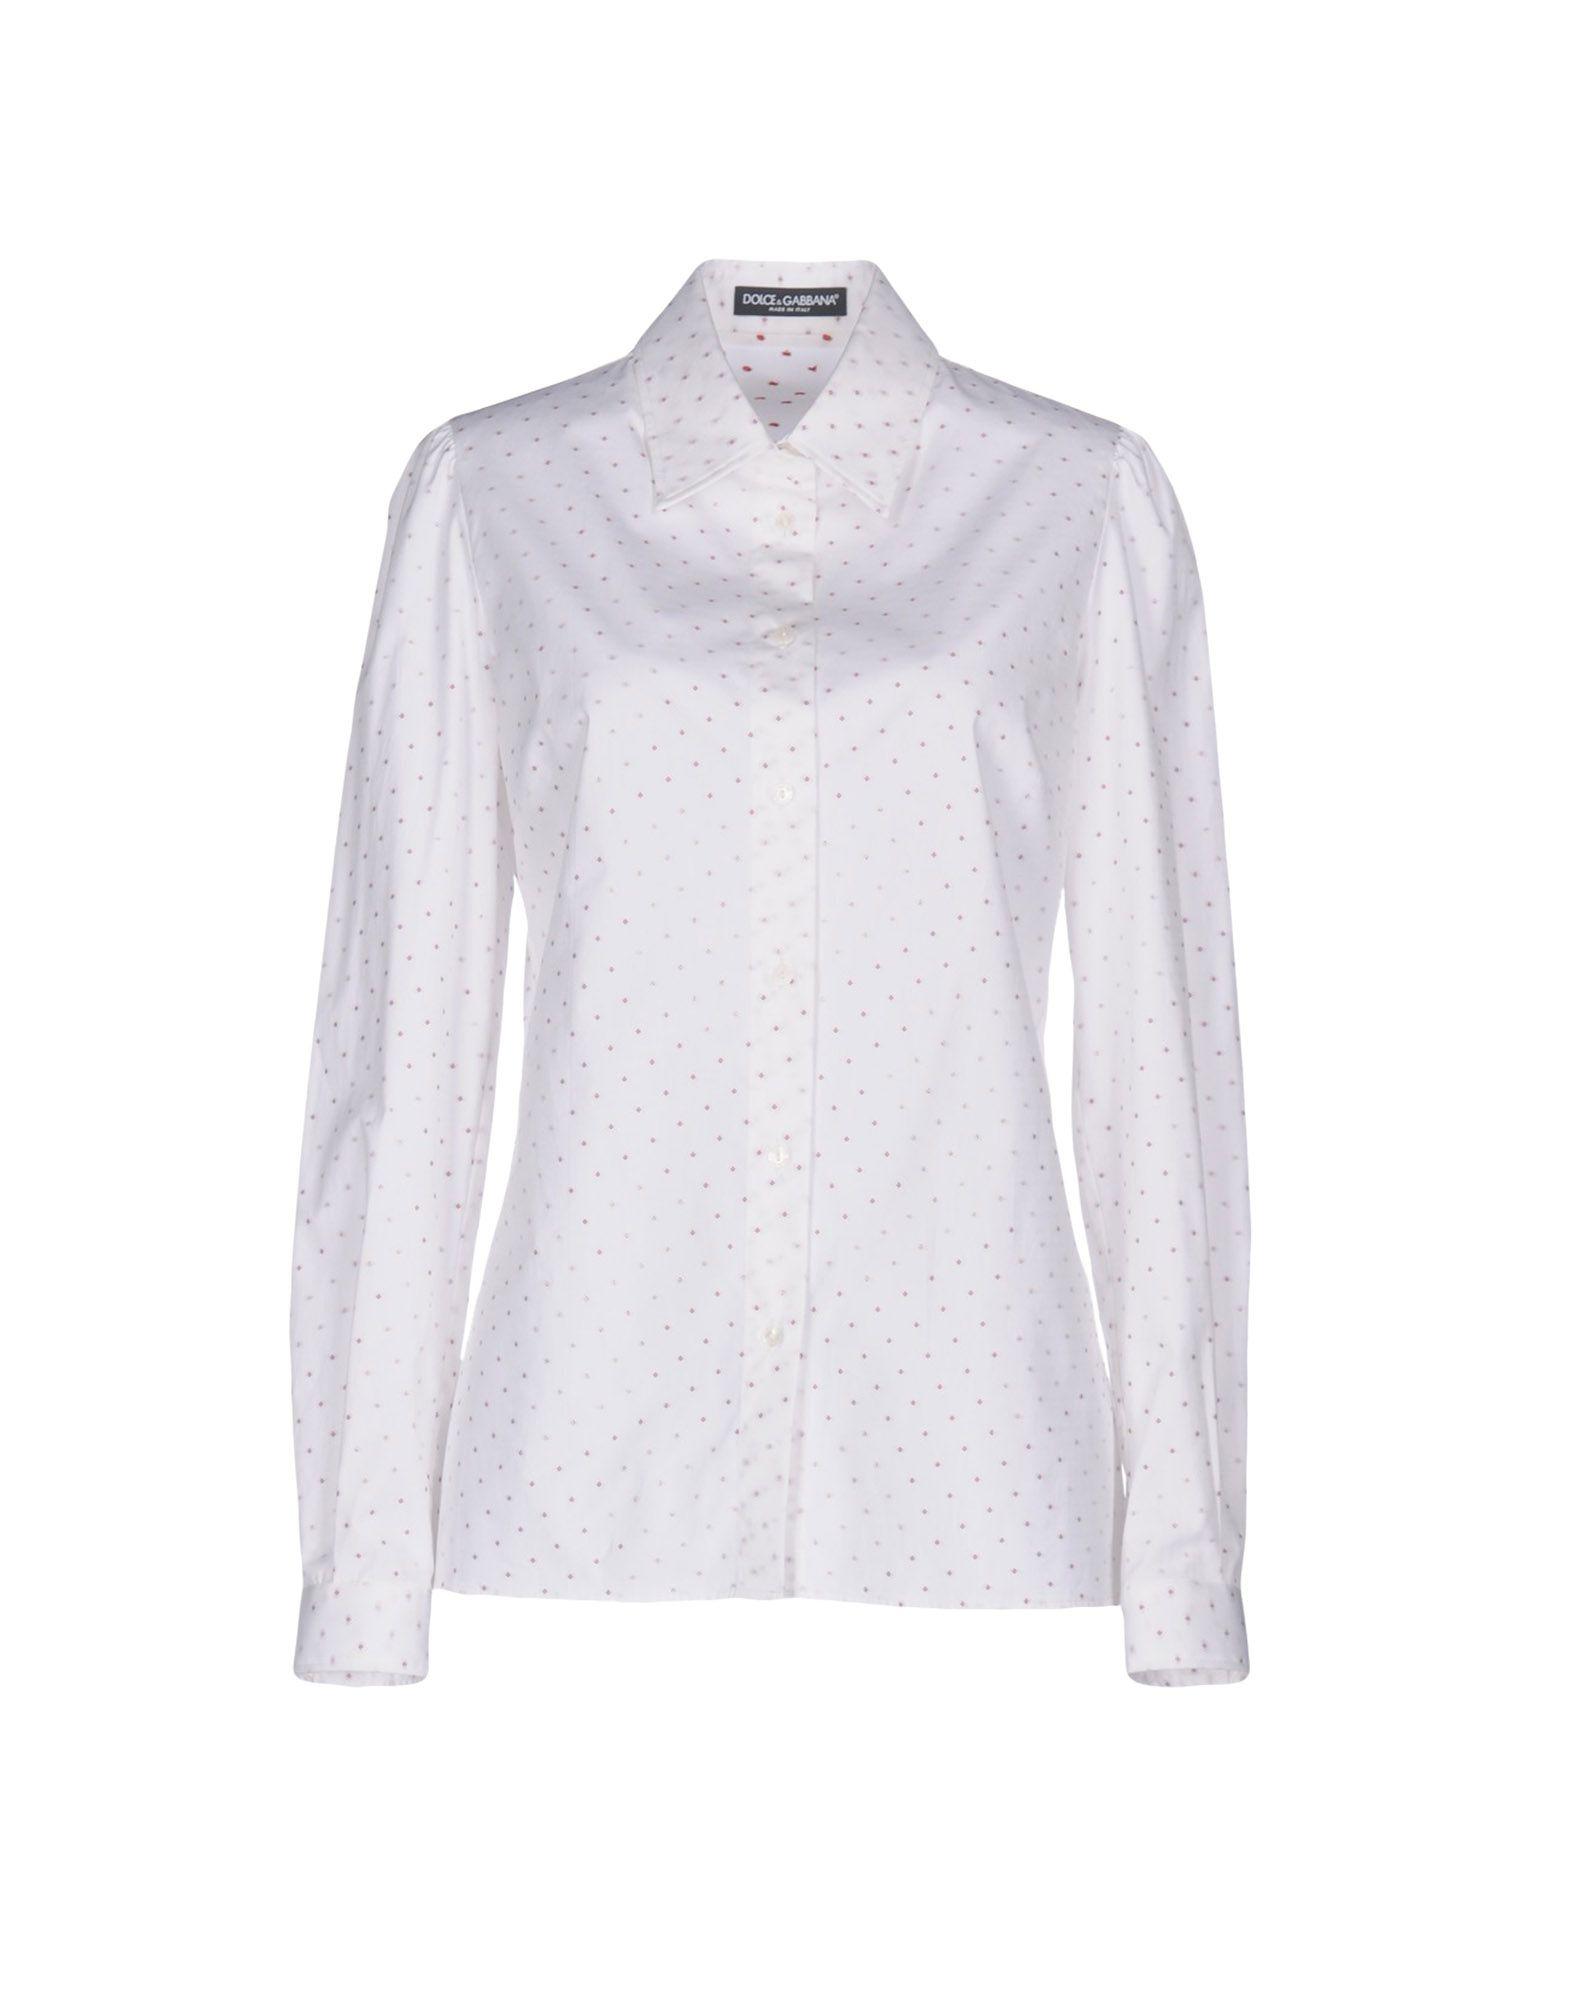 DOLCE & GABBANA Damen Hemd Farbe Weiß Größe 4